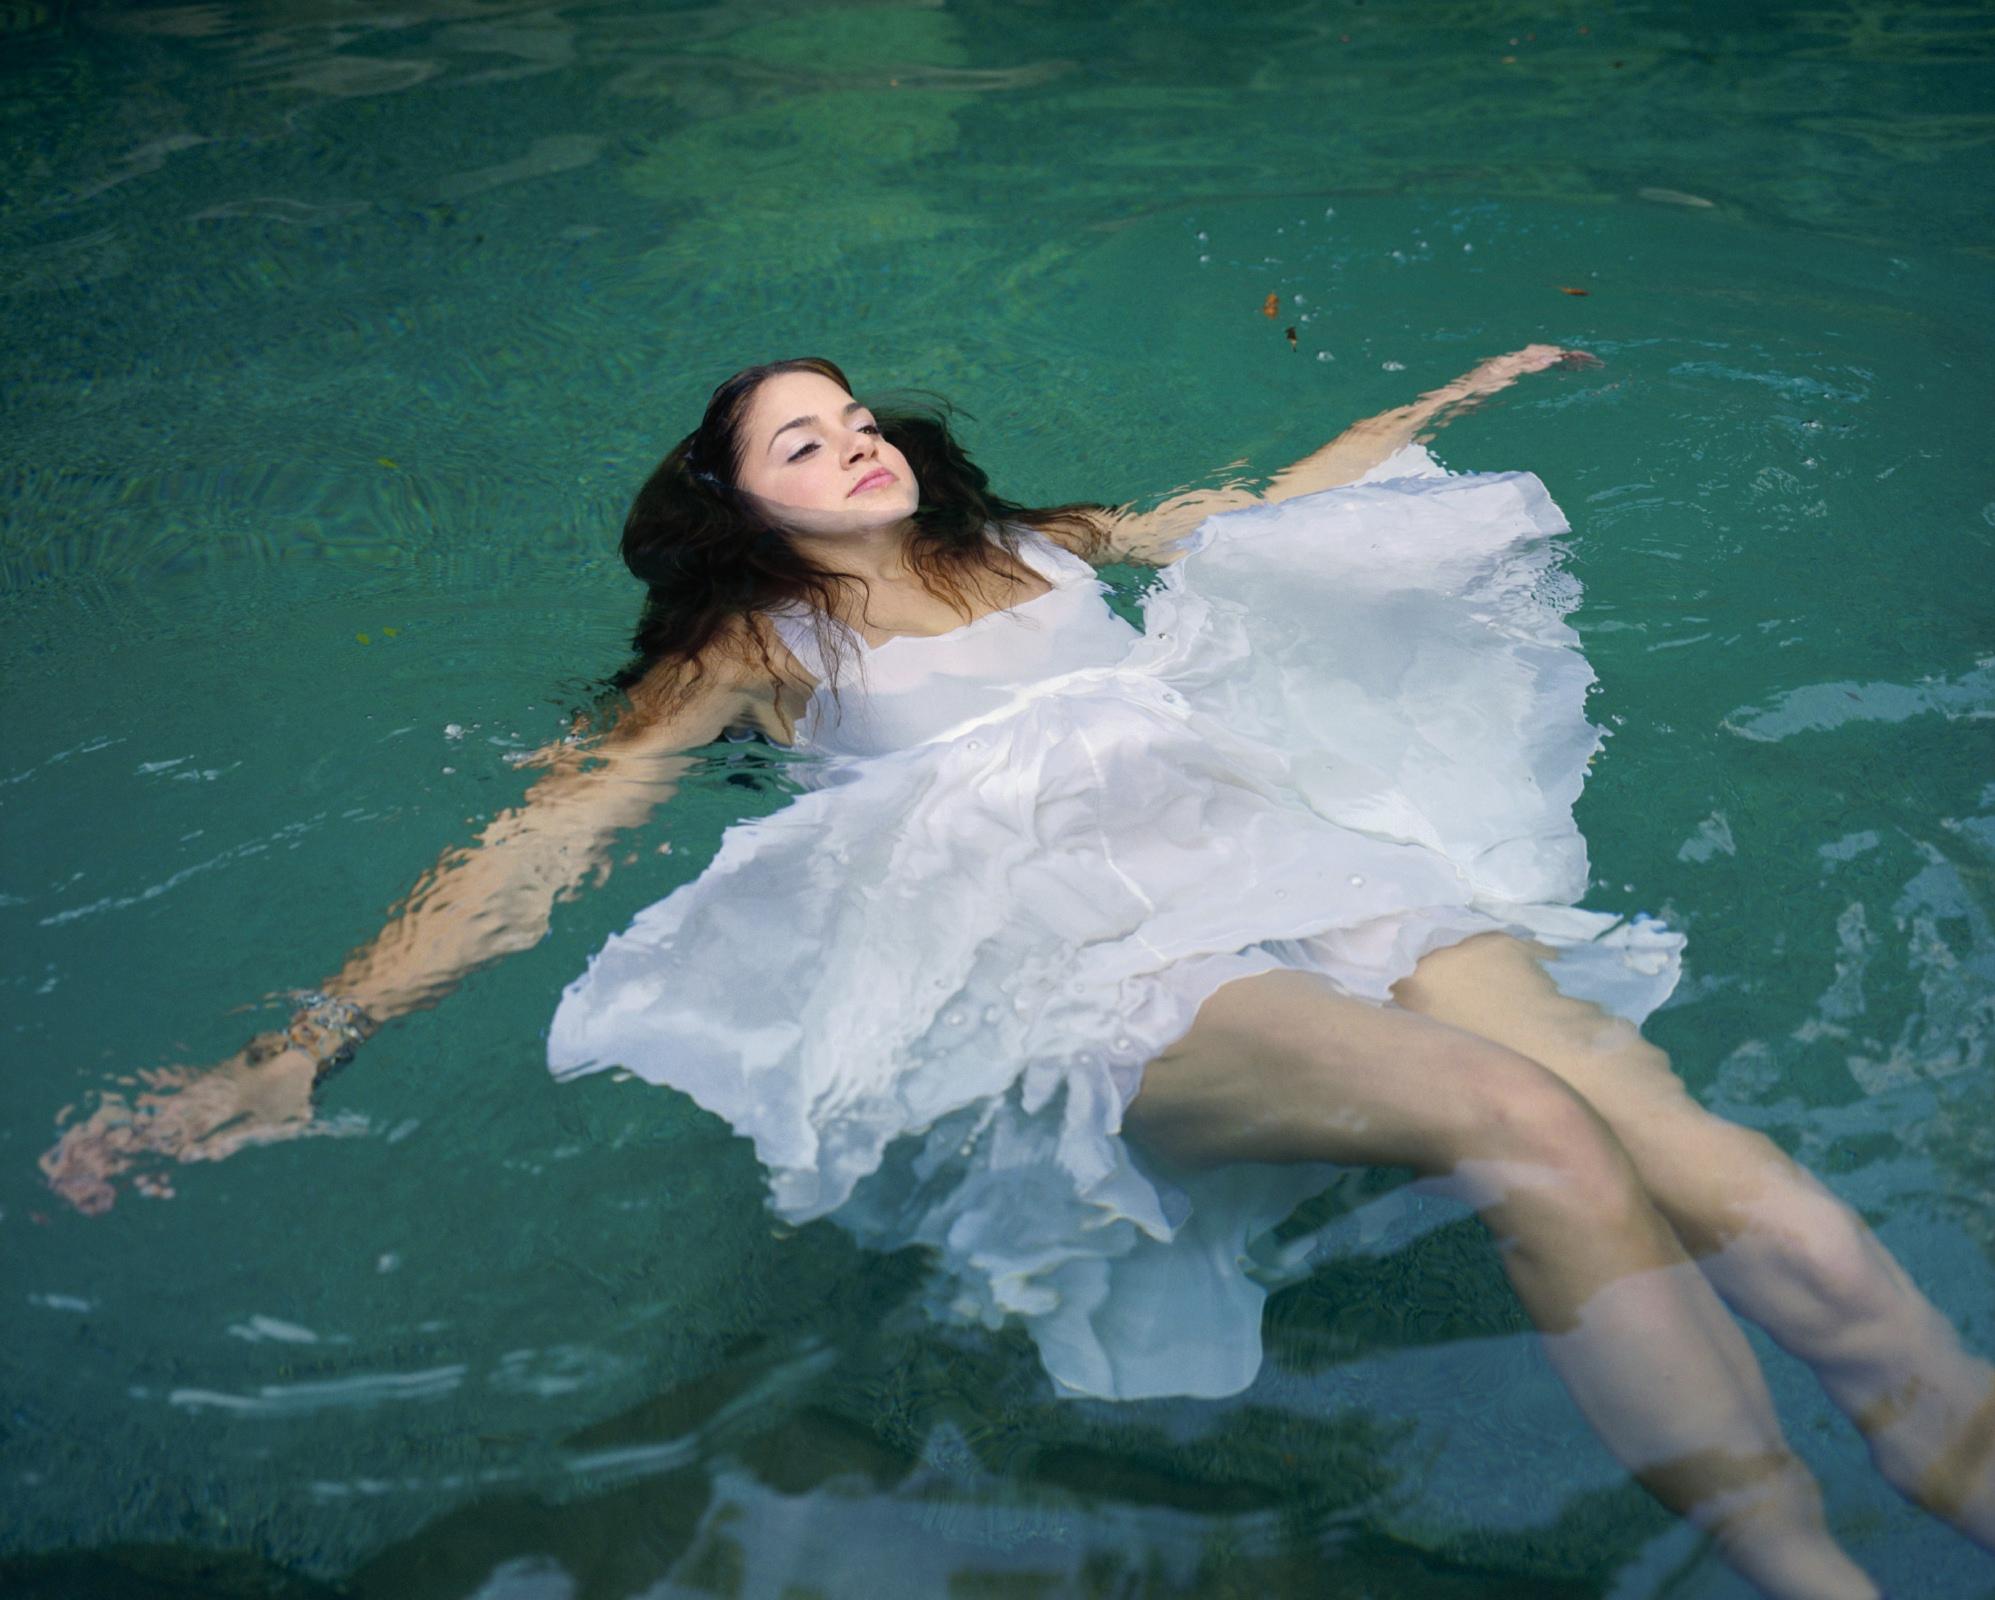 Фото девушки в воде 1 фотография